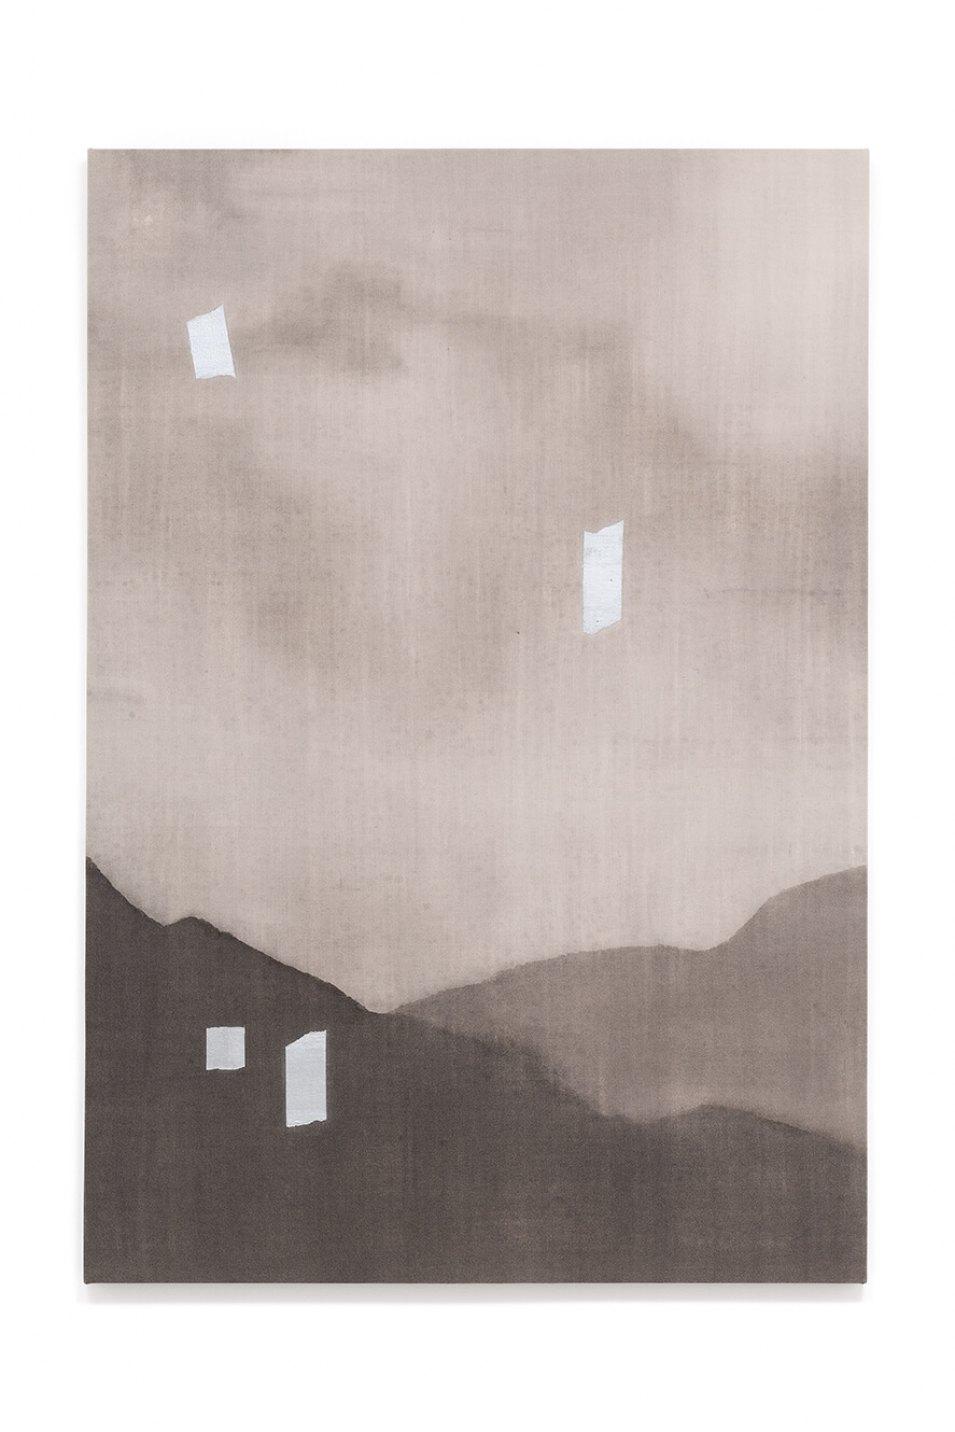 Francesco João Scavarda,<em>untitled</em>,2016,gouache on raw canvas,145 × 100 × 4 cm - Mendes Wood DM